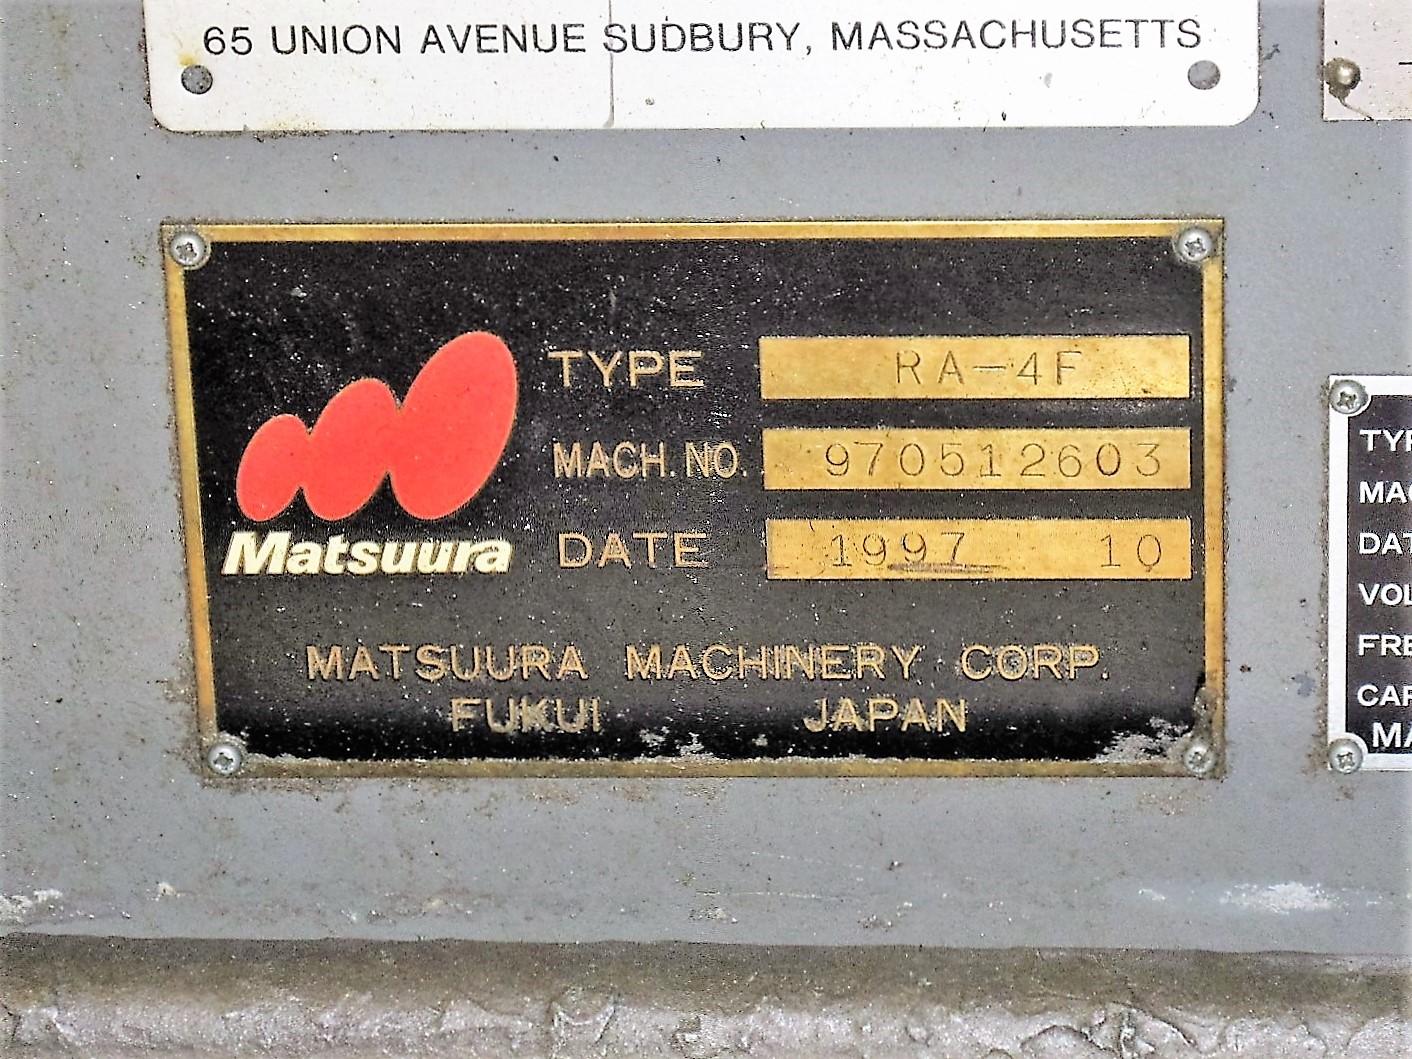 MATSUURA RA-4F CNC VERTICAL MACHINING CENTER WITH APC - Image 10 of 12